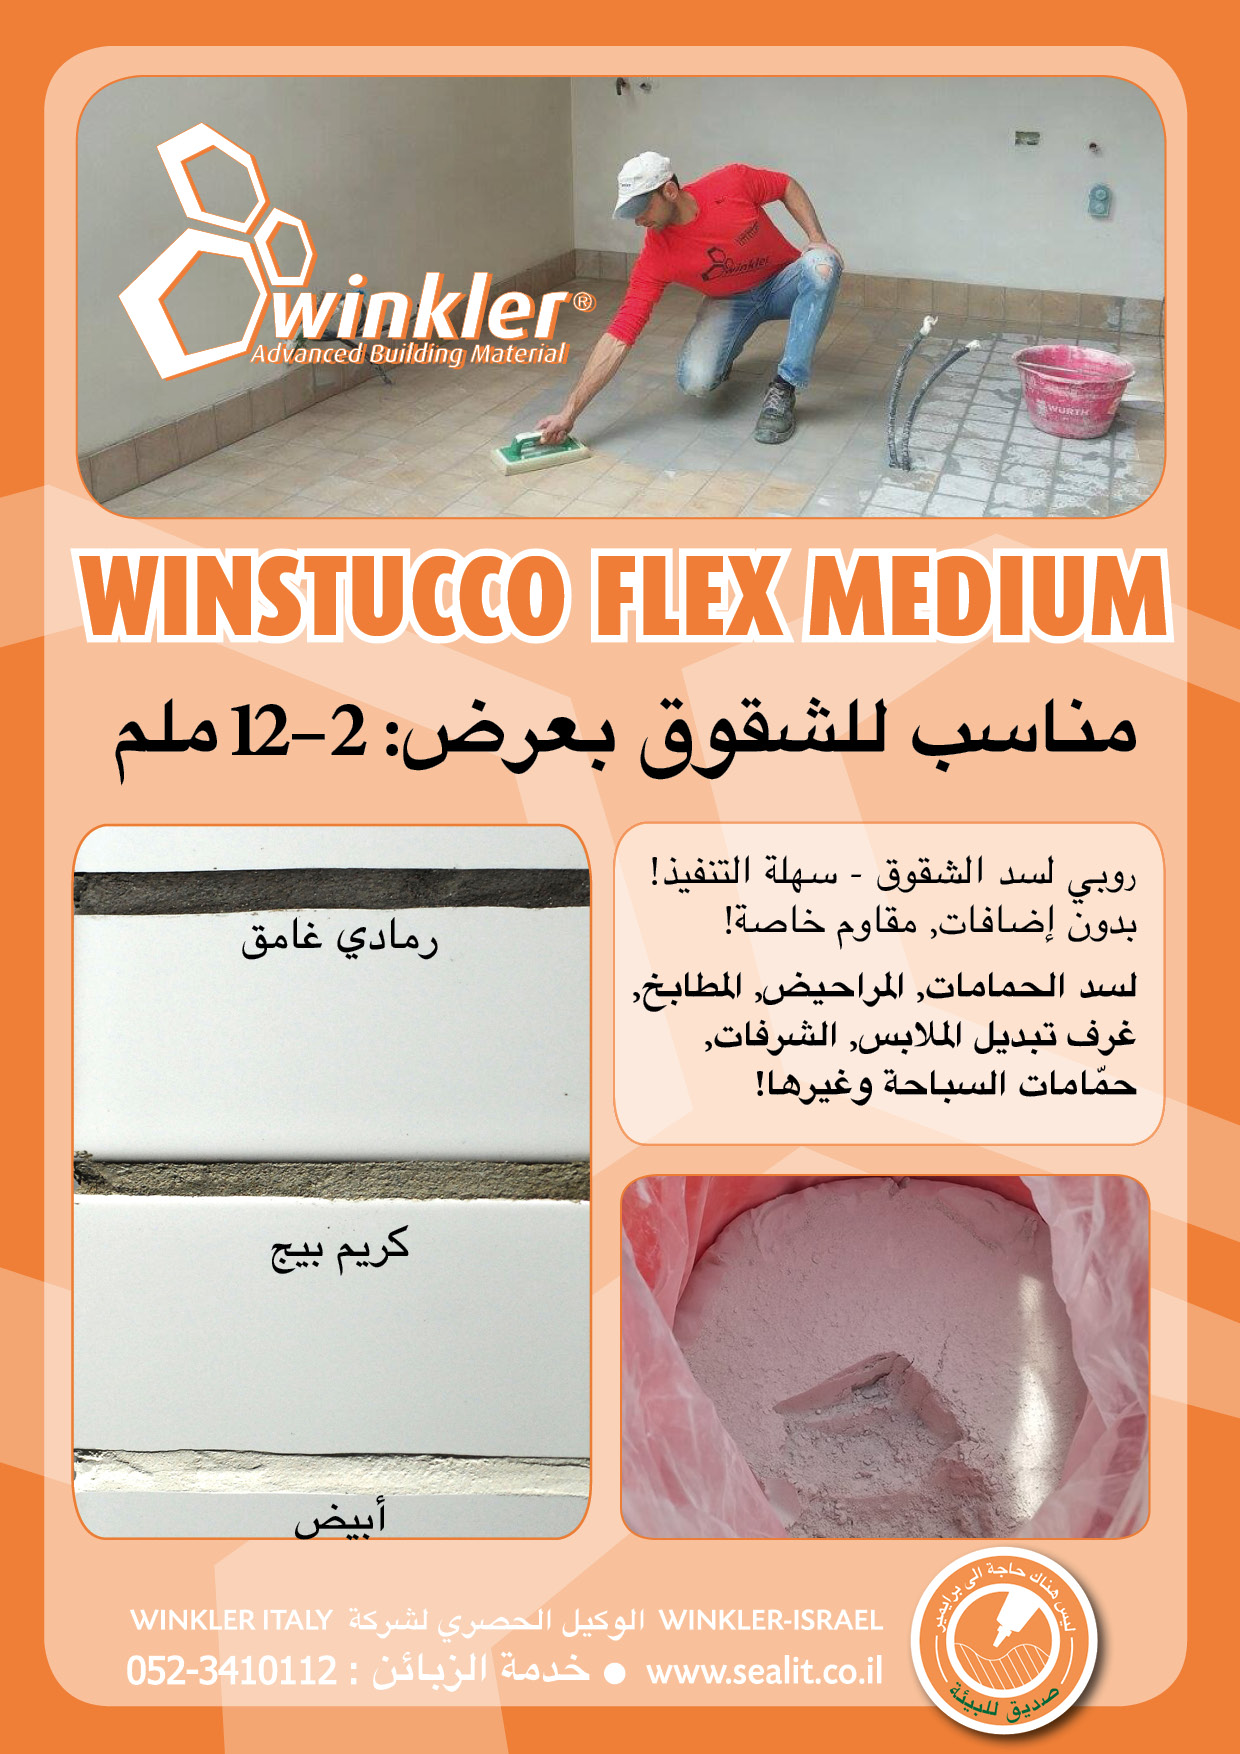 flyer-WINSTUCCO flex medium-arab